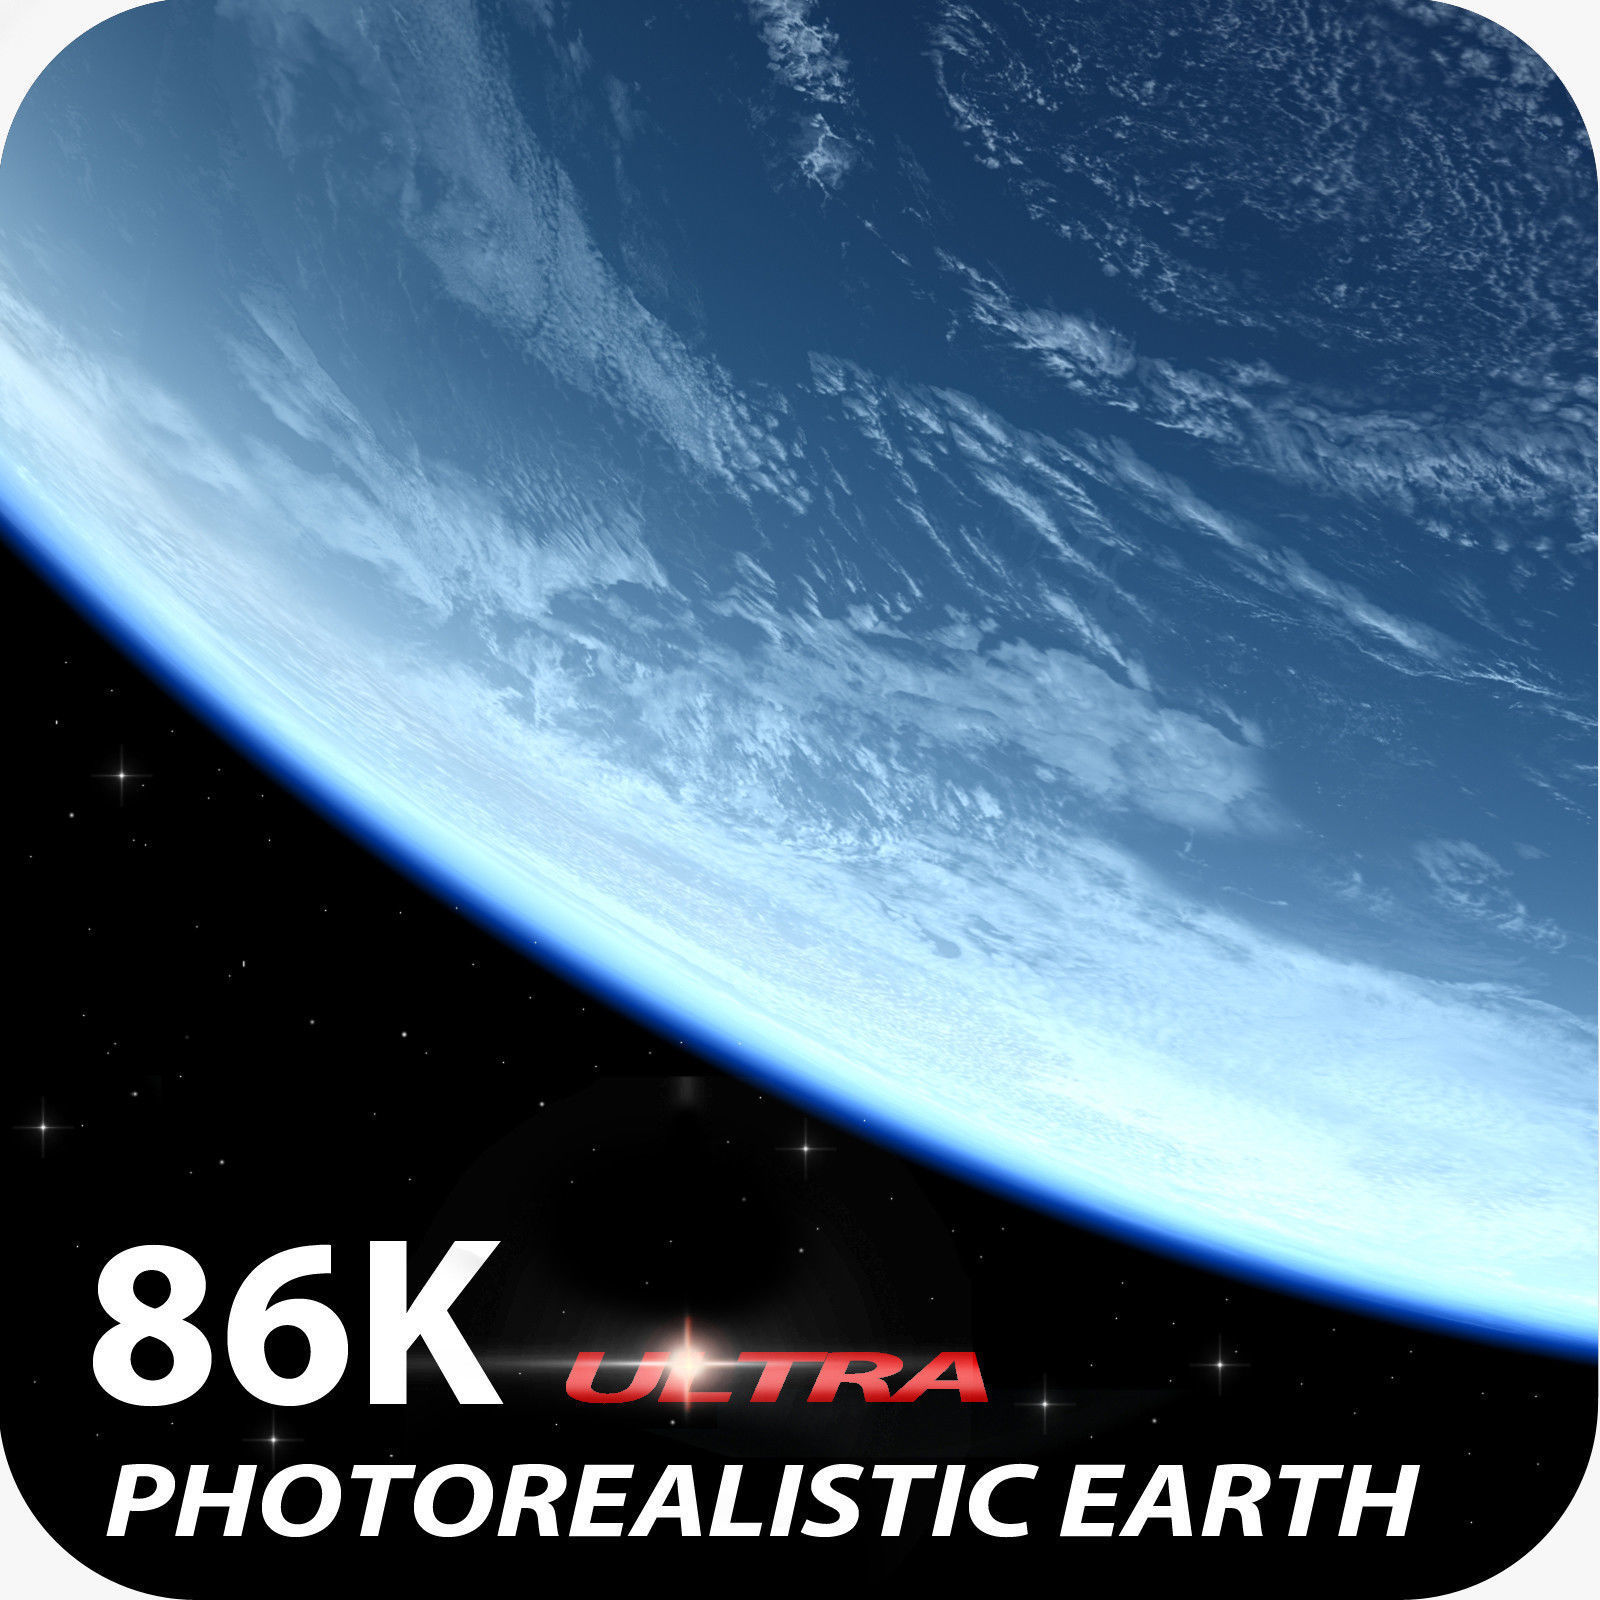 86K Photorealistic Earth